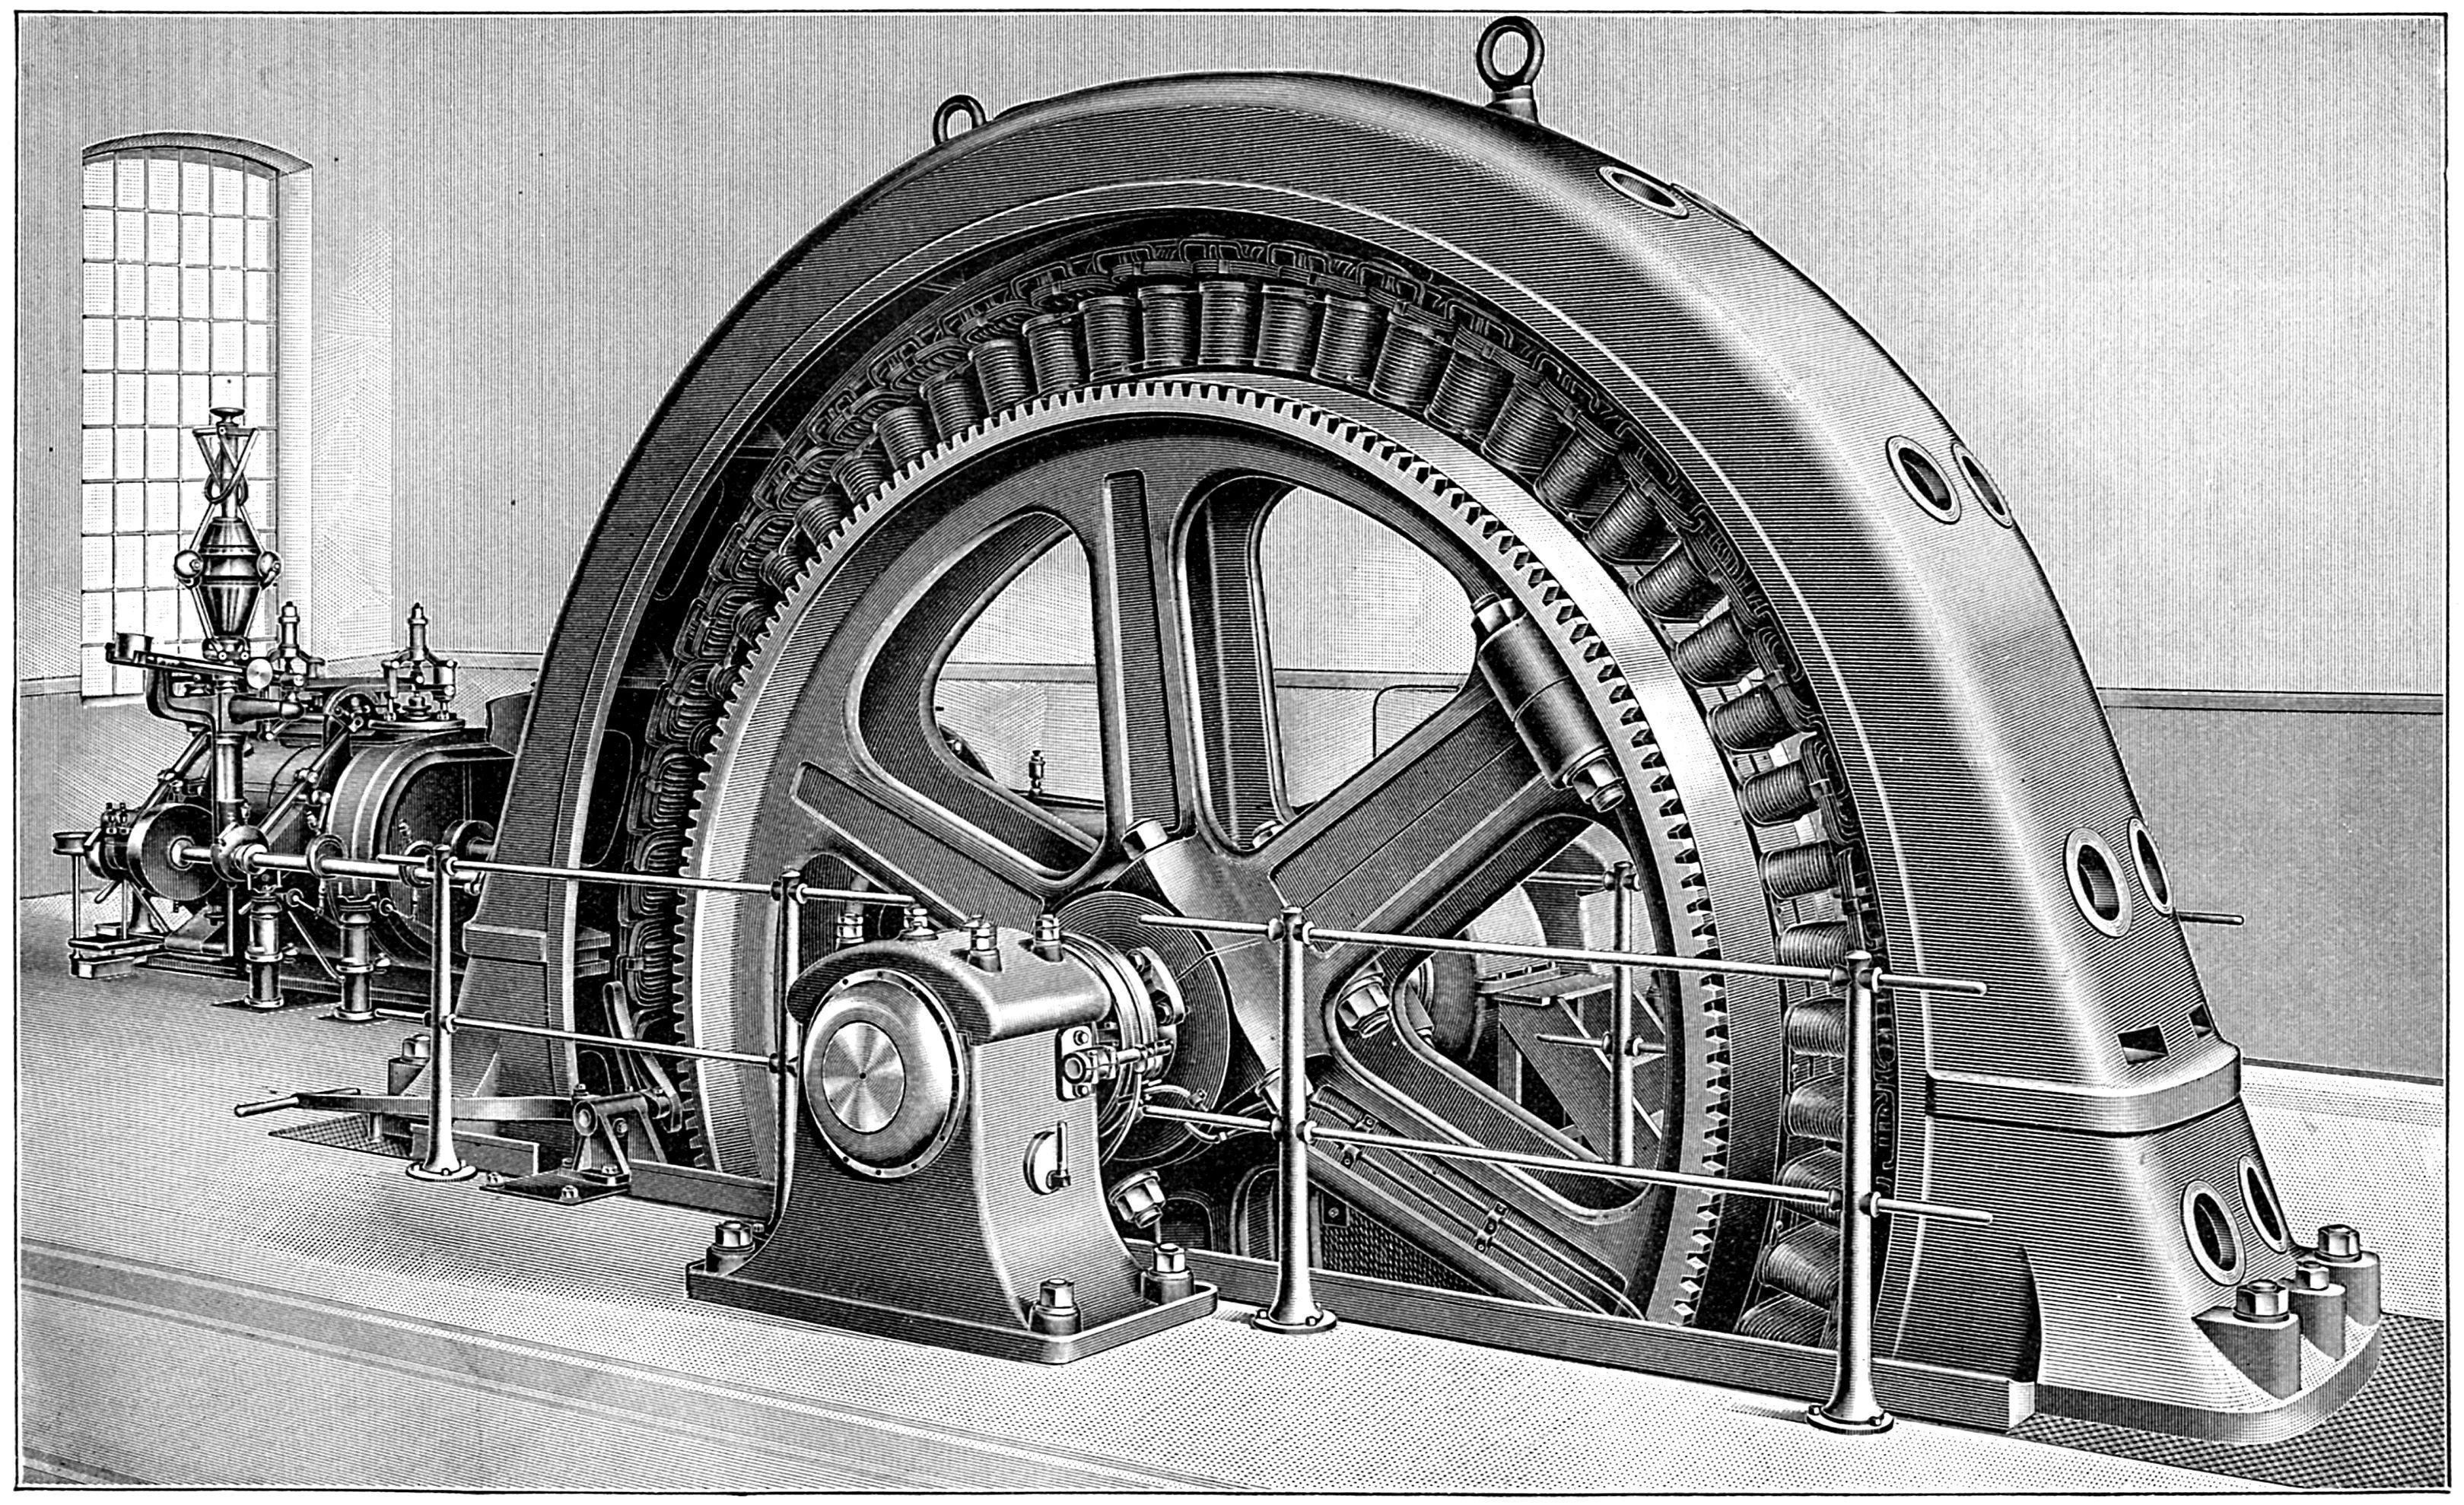 Tesla Powerwall - Wikipedia